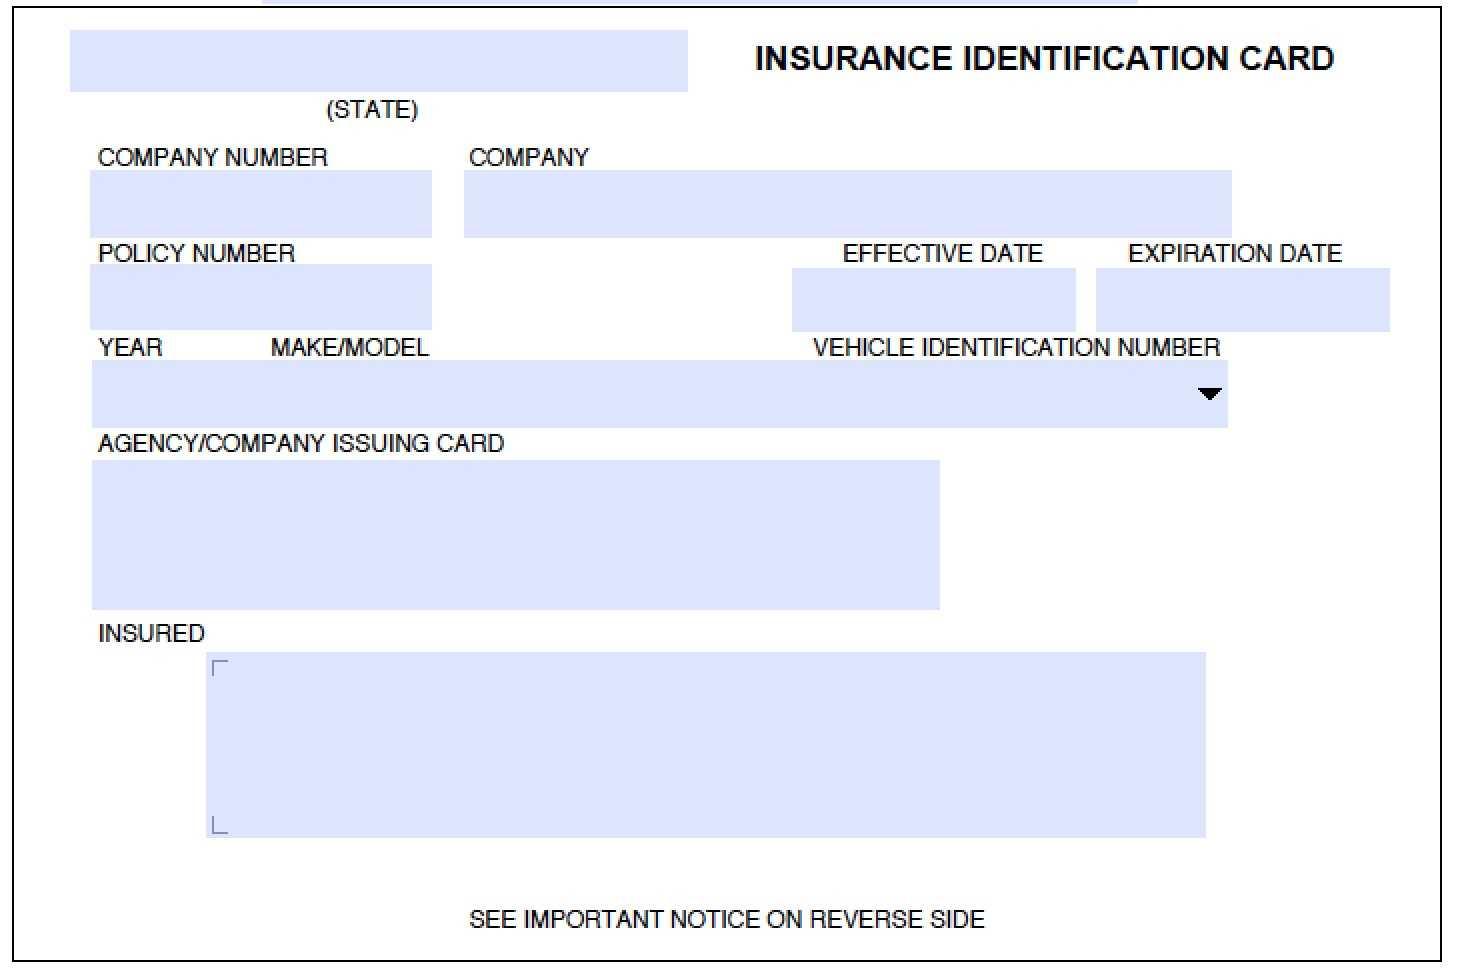 012 Company Car Policy Template Free Auto Insurance Id Card For Auto Insurance Id Card Template